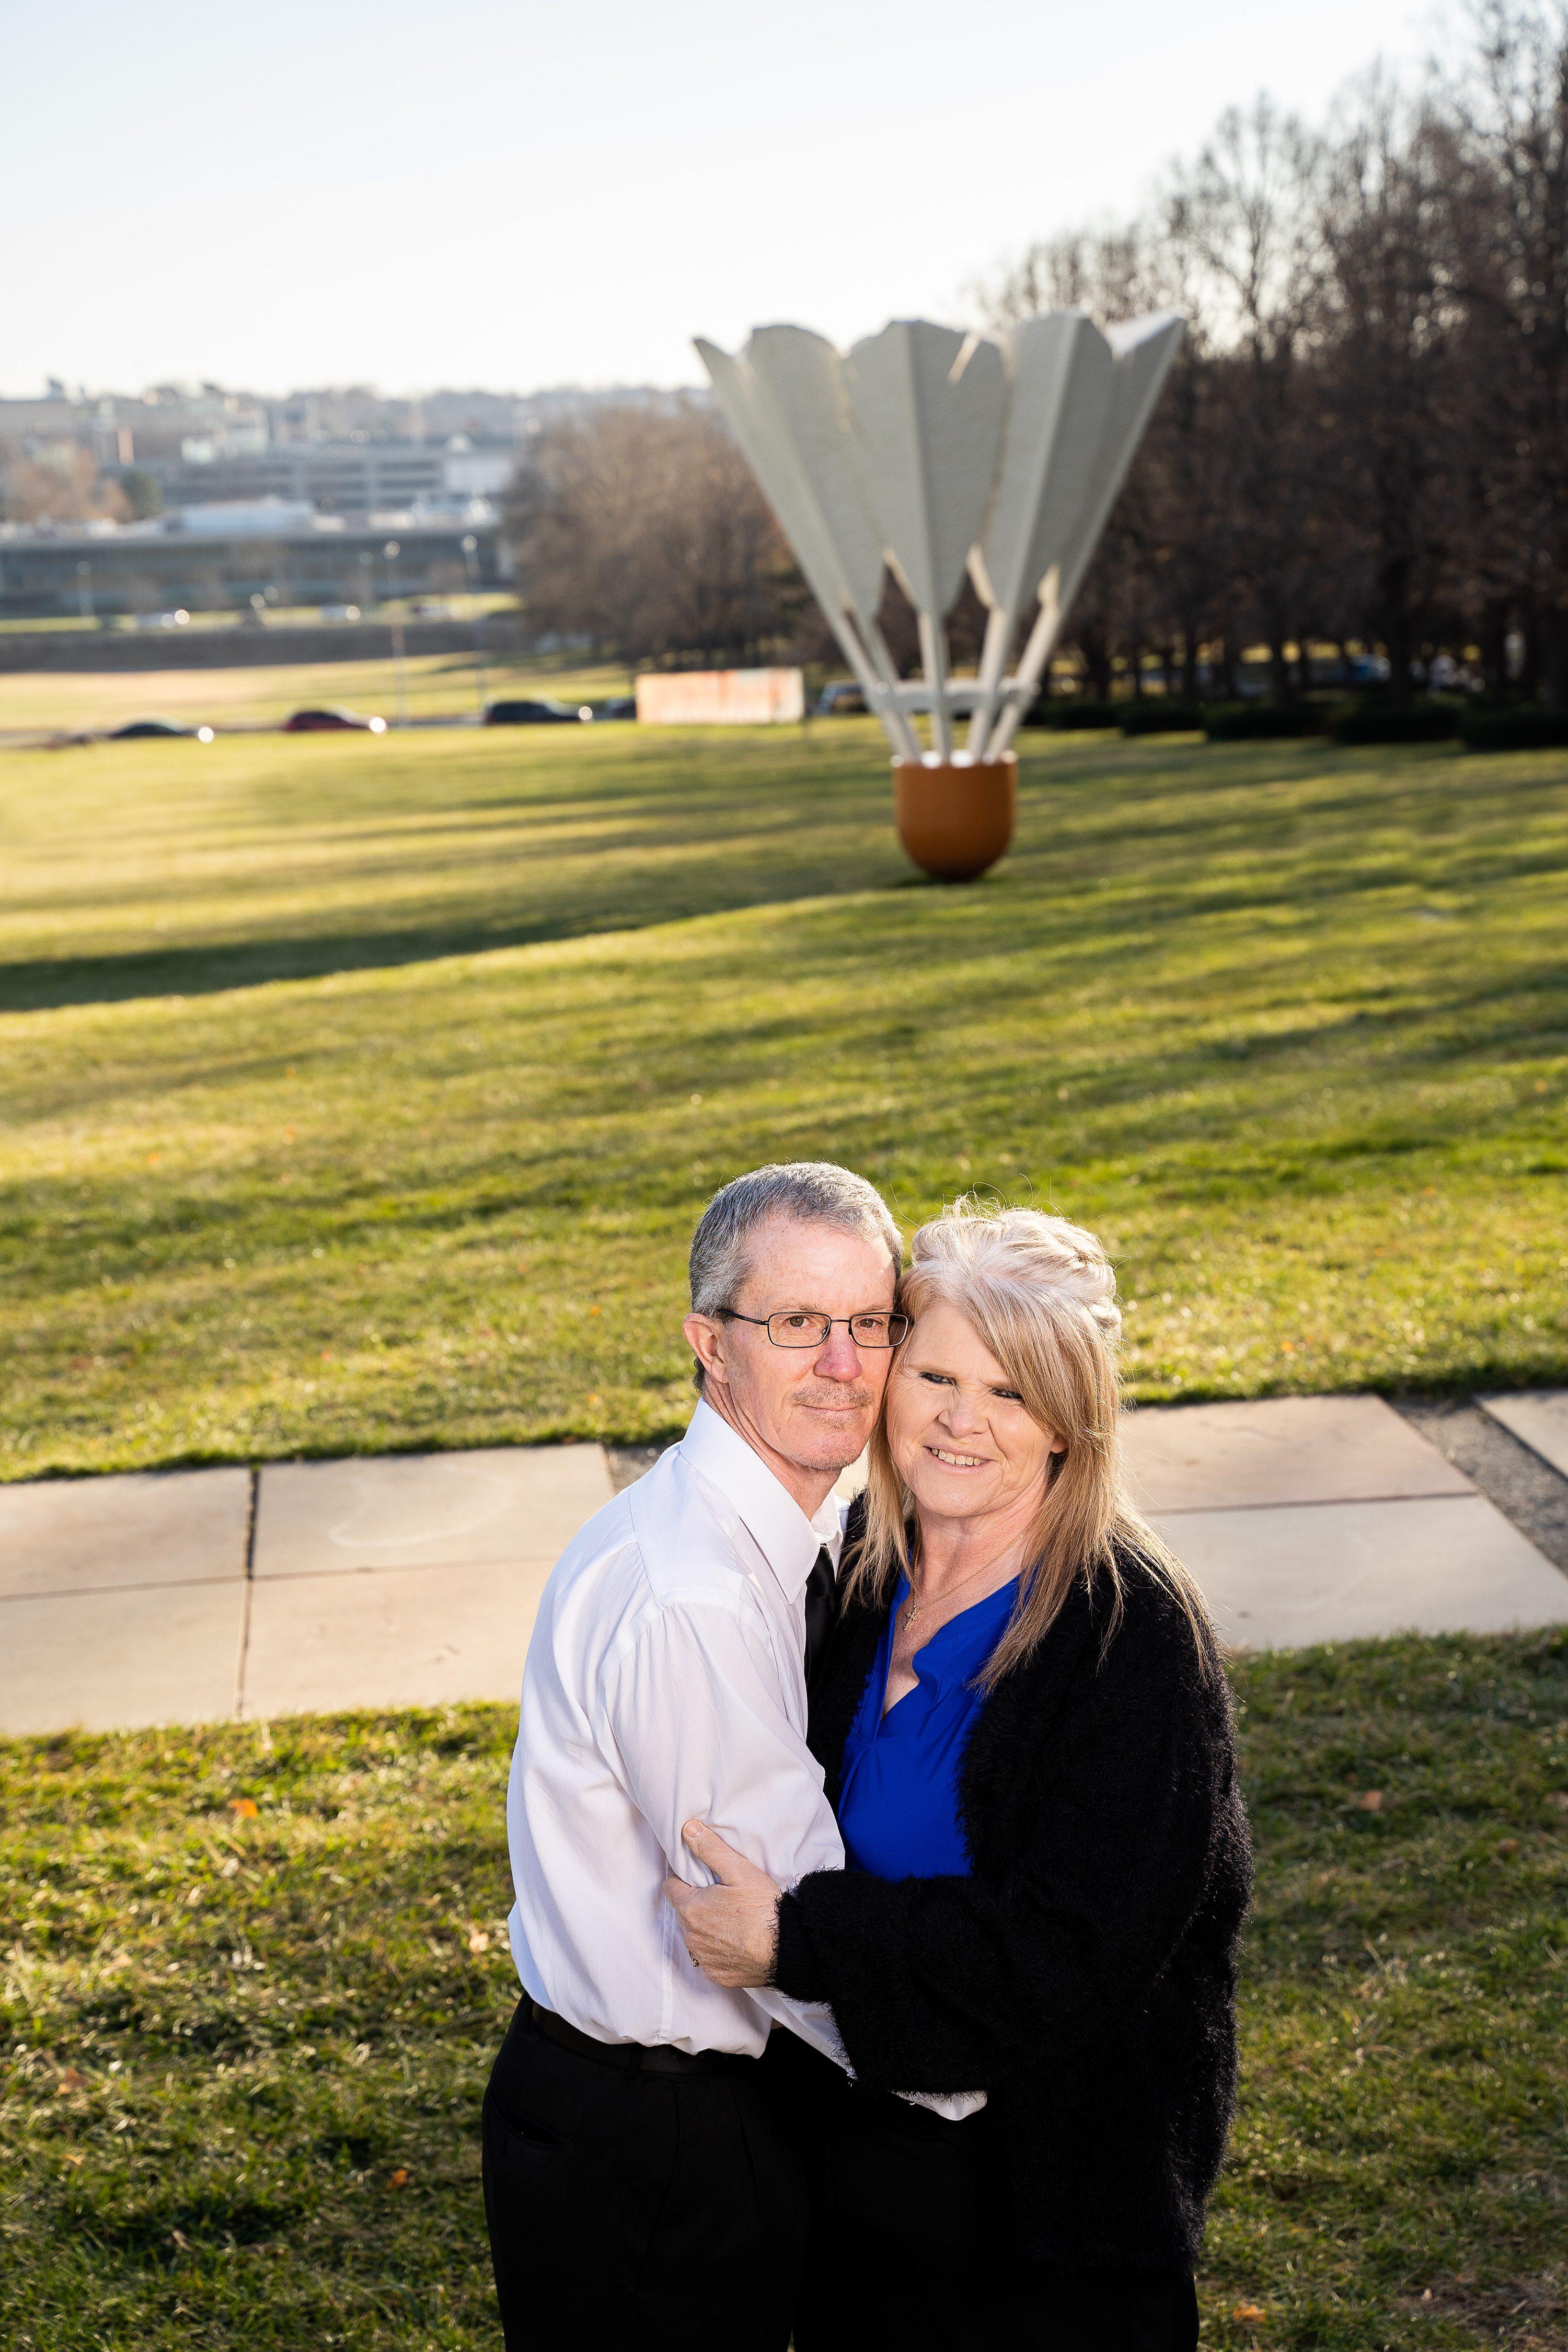 Couples Photography,Kansas City Missouri Photography